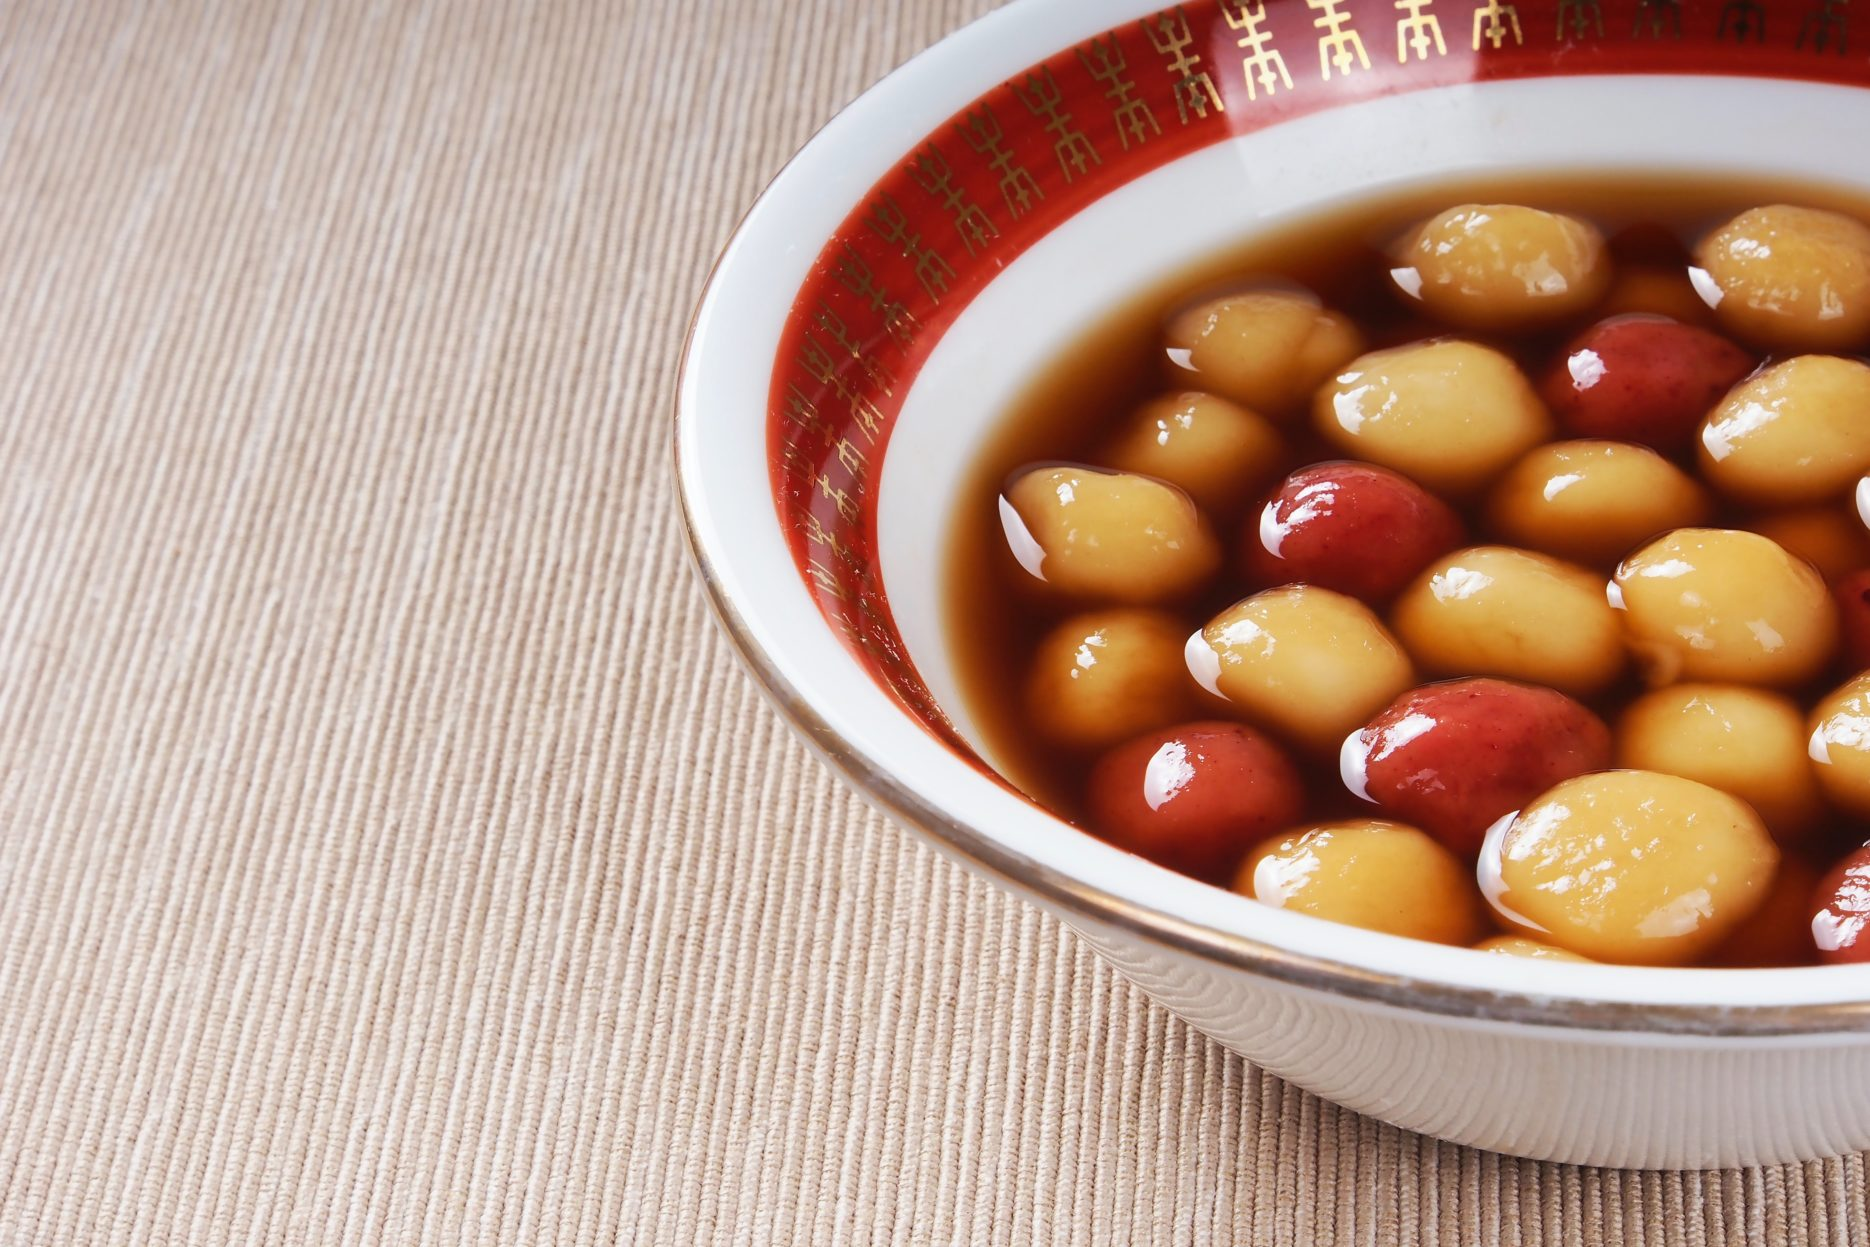 Lantern Festival common food tangyuan. Credit: Unsplash